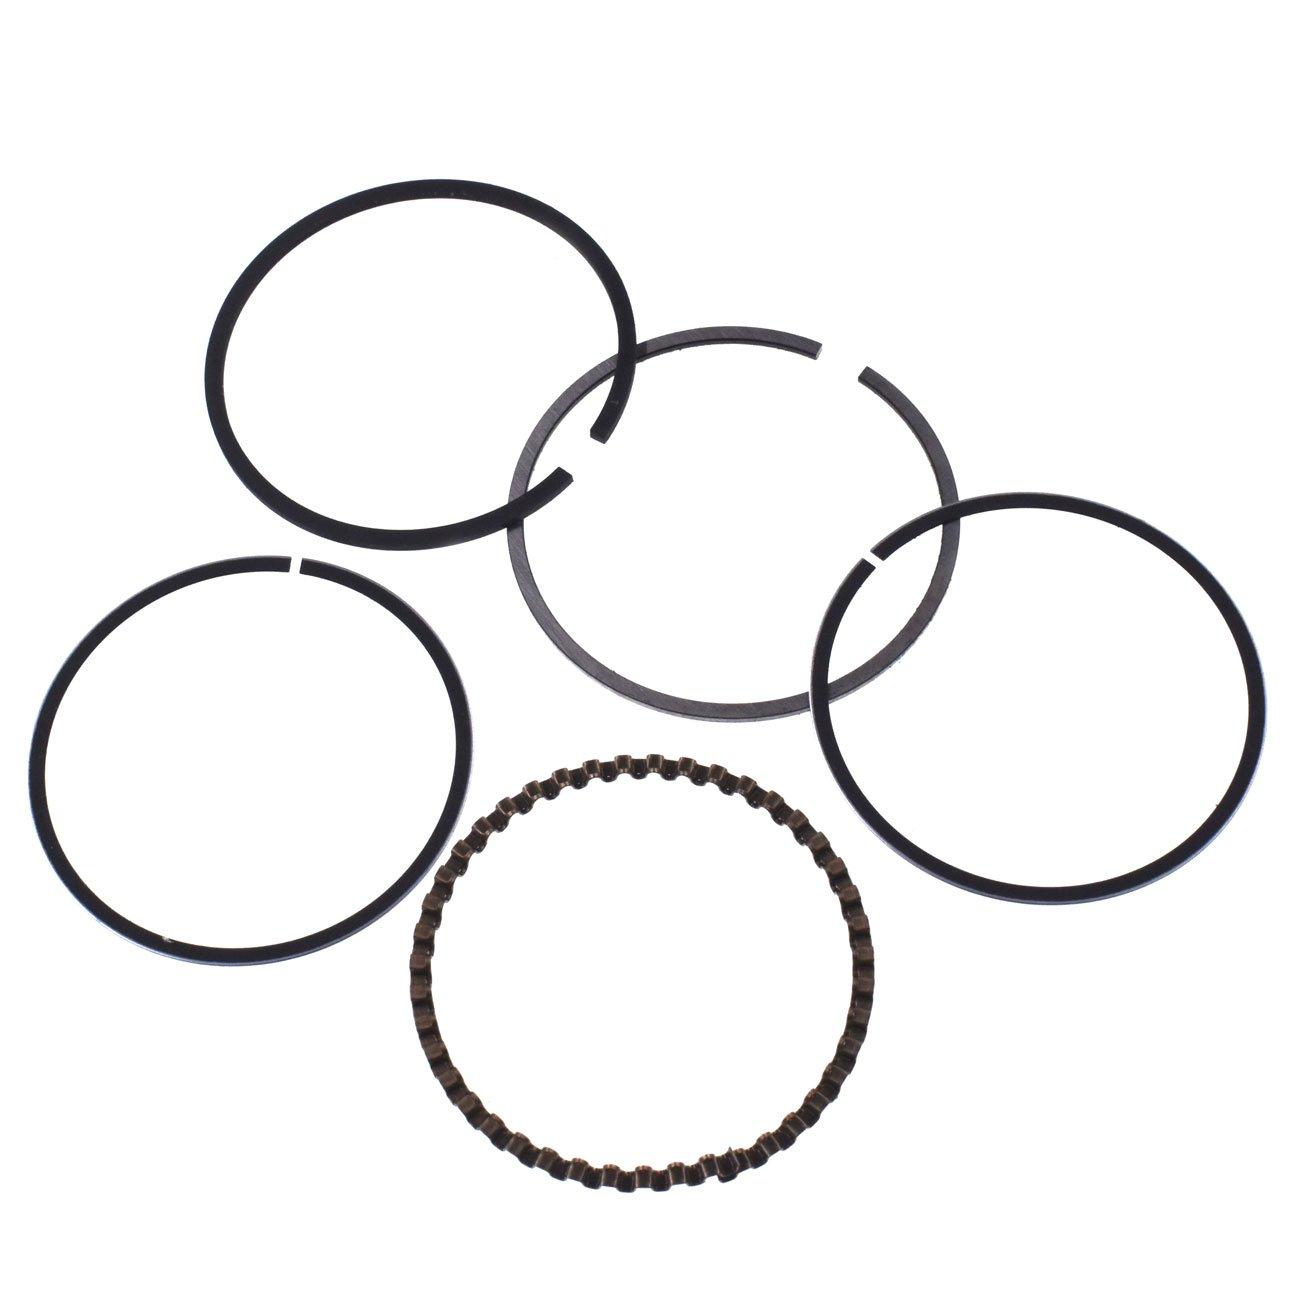 anillos de pist/ón para cortac/ésped Honda GX35 UMK435 39/mm Cortador de cepillo